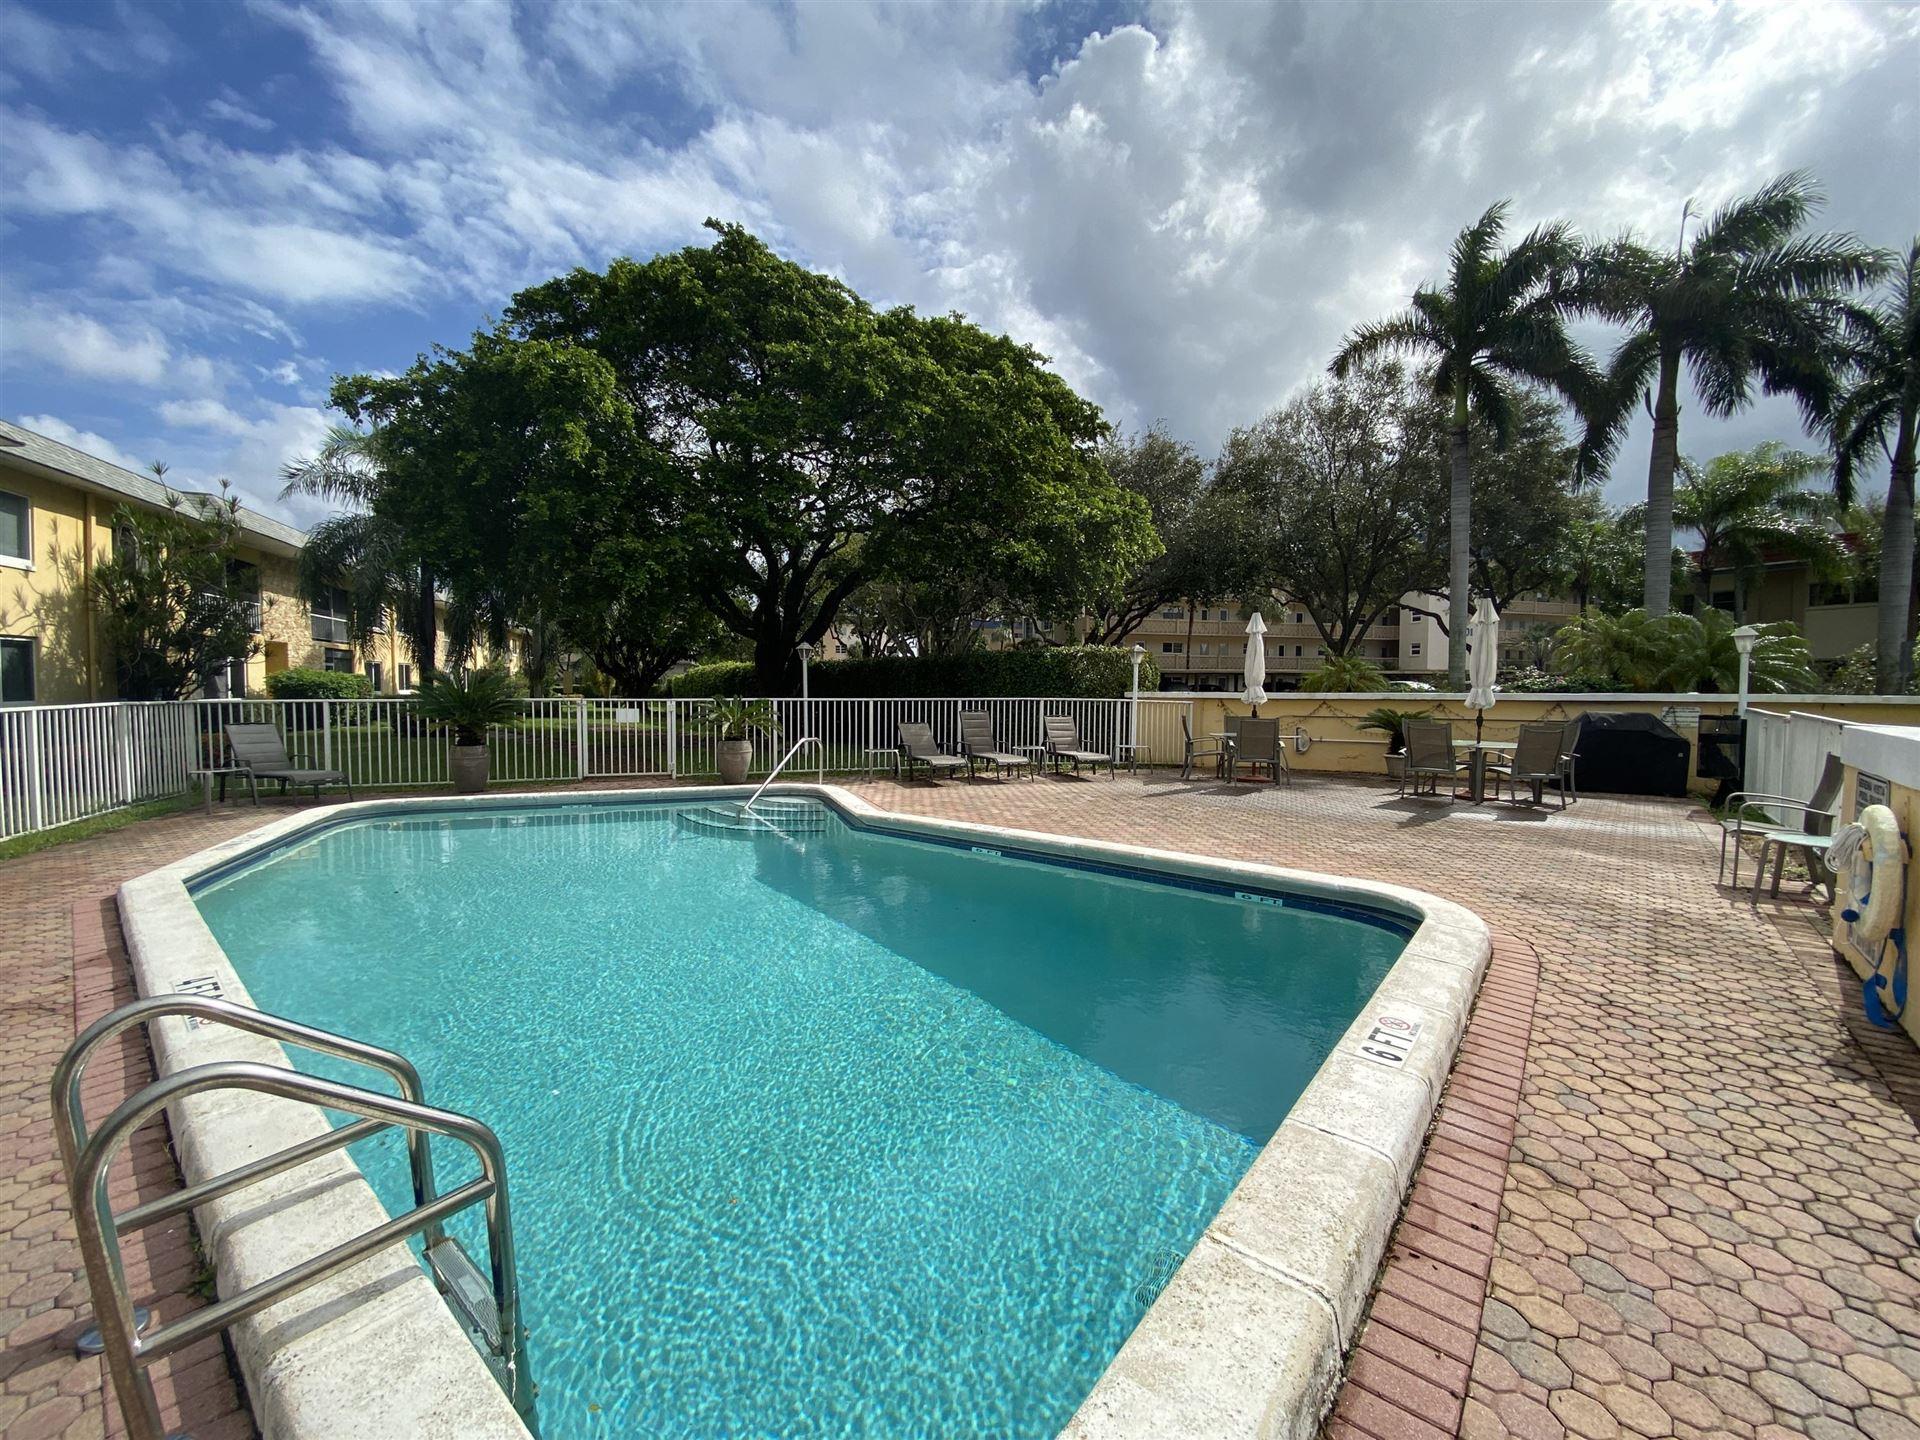 207 Tropic Isle Drive #2140, Delray Beach, FL 33483 - #: RX-10672091